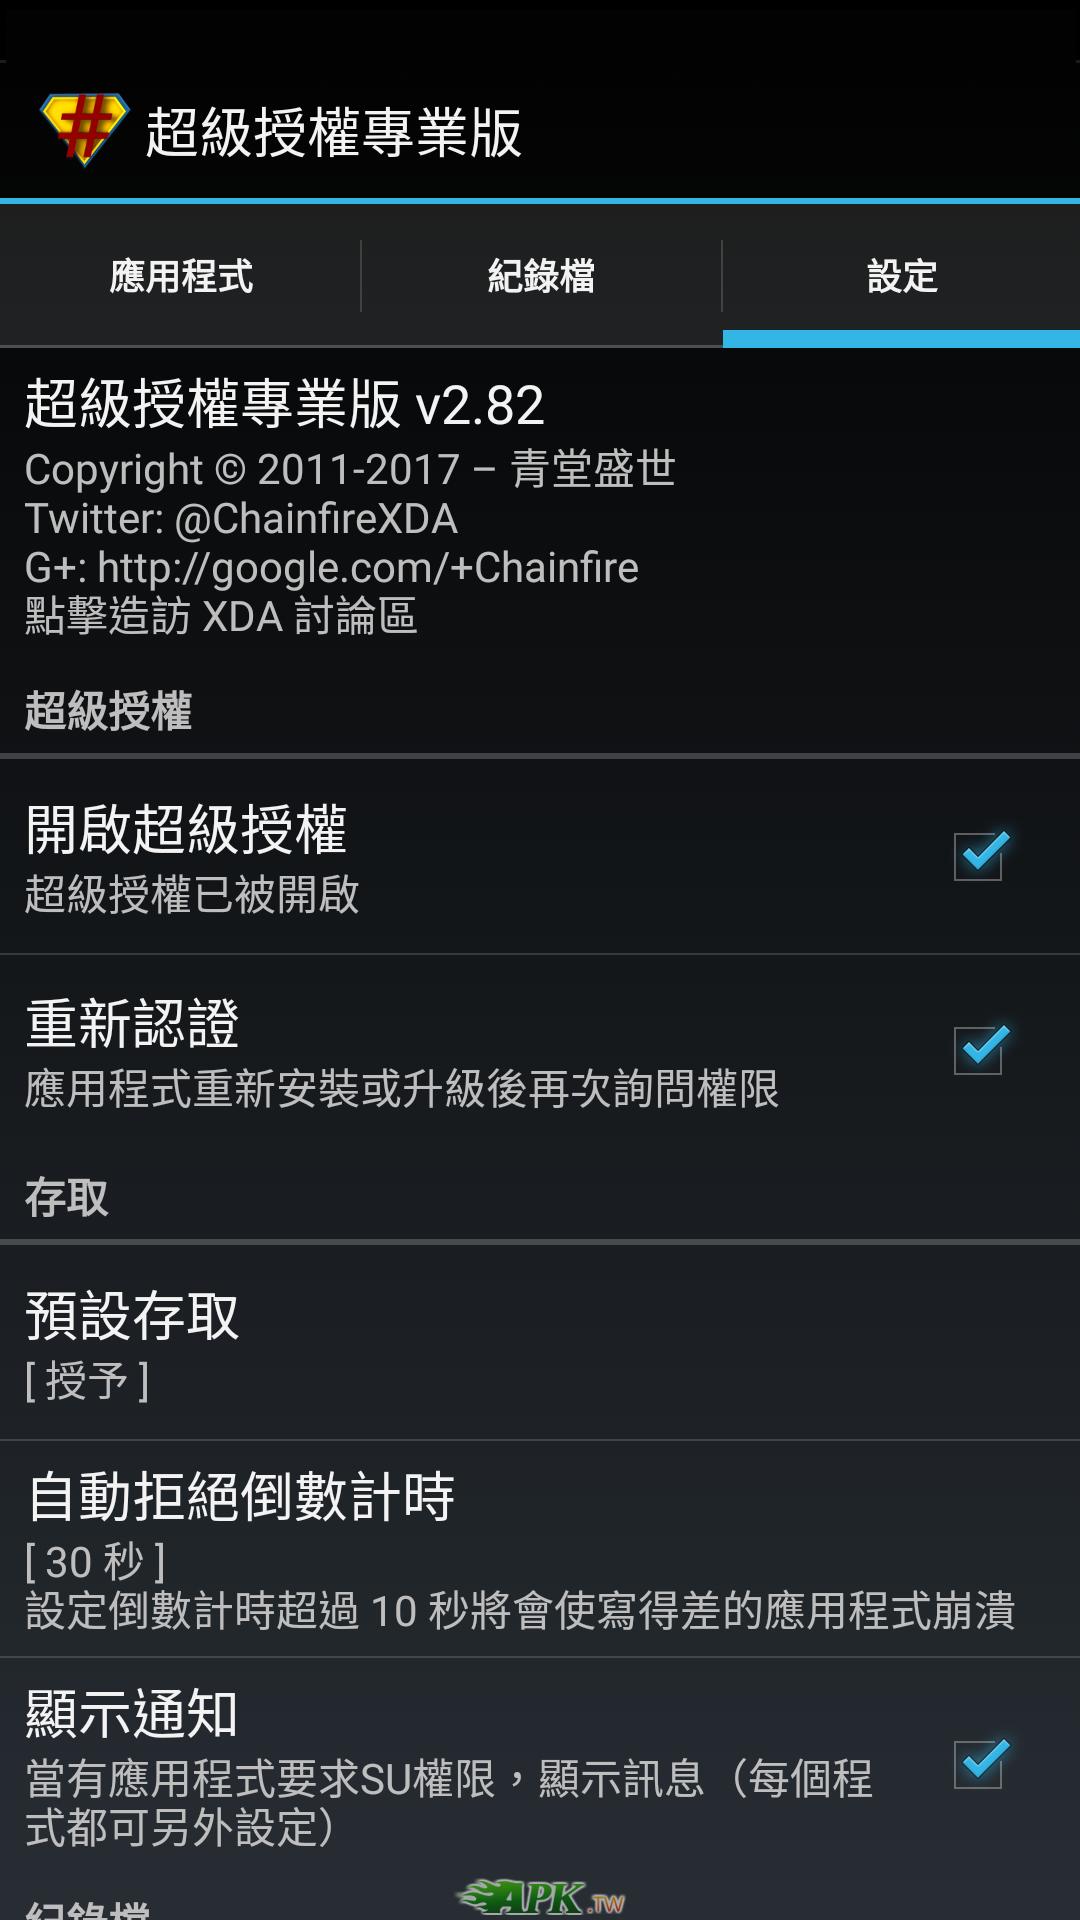 Screenshot_2017-05-29-22-54-05-208_eu.chainfire.supersu[1].png